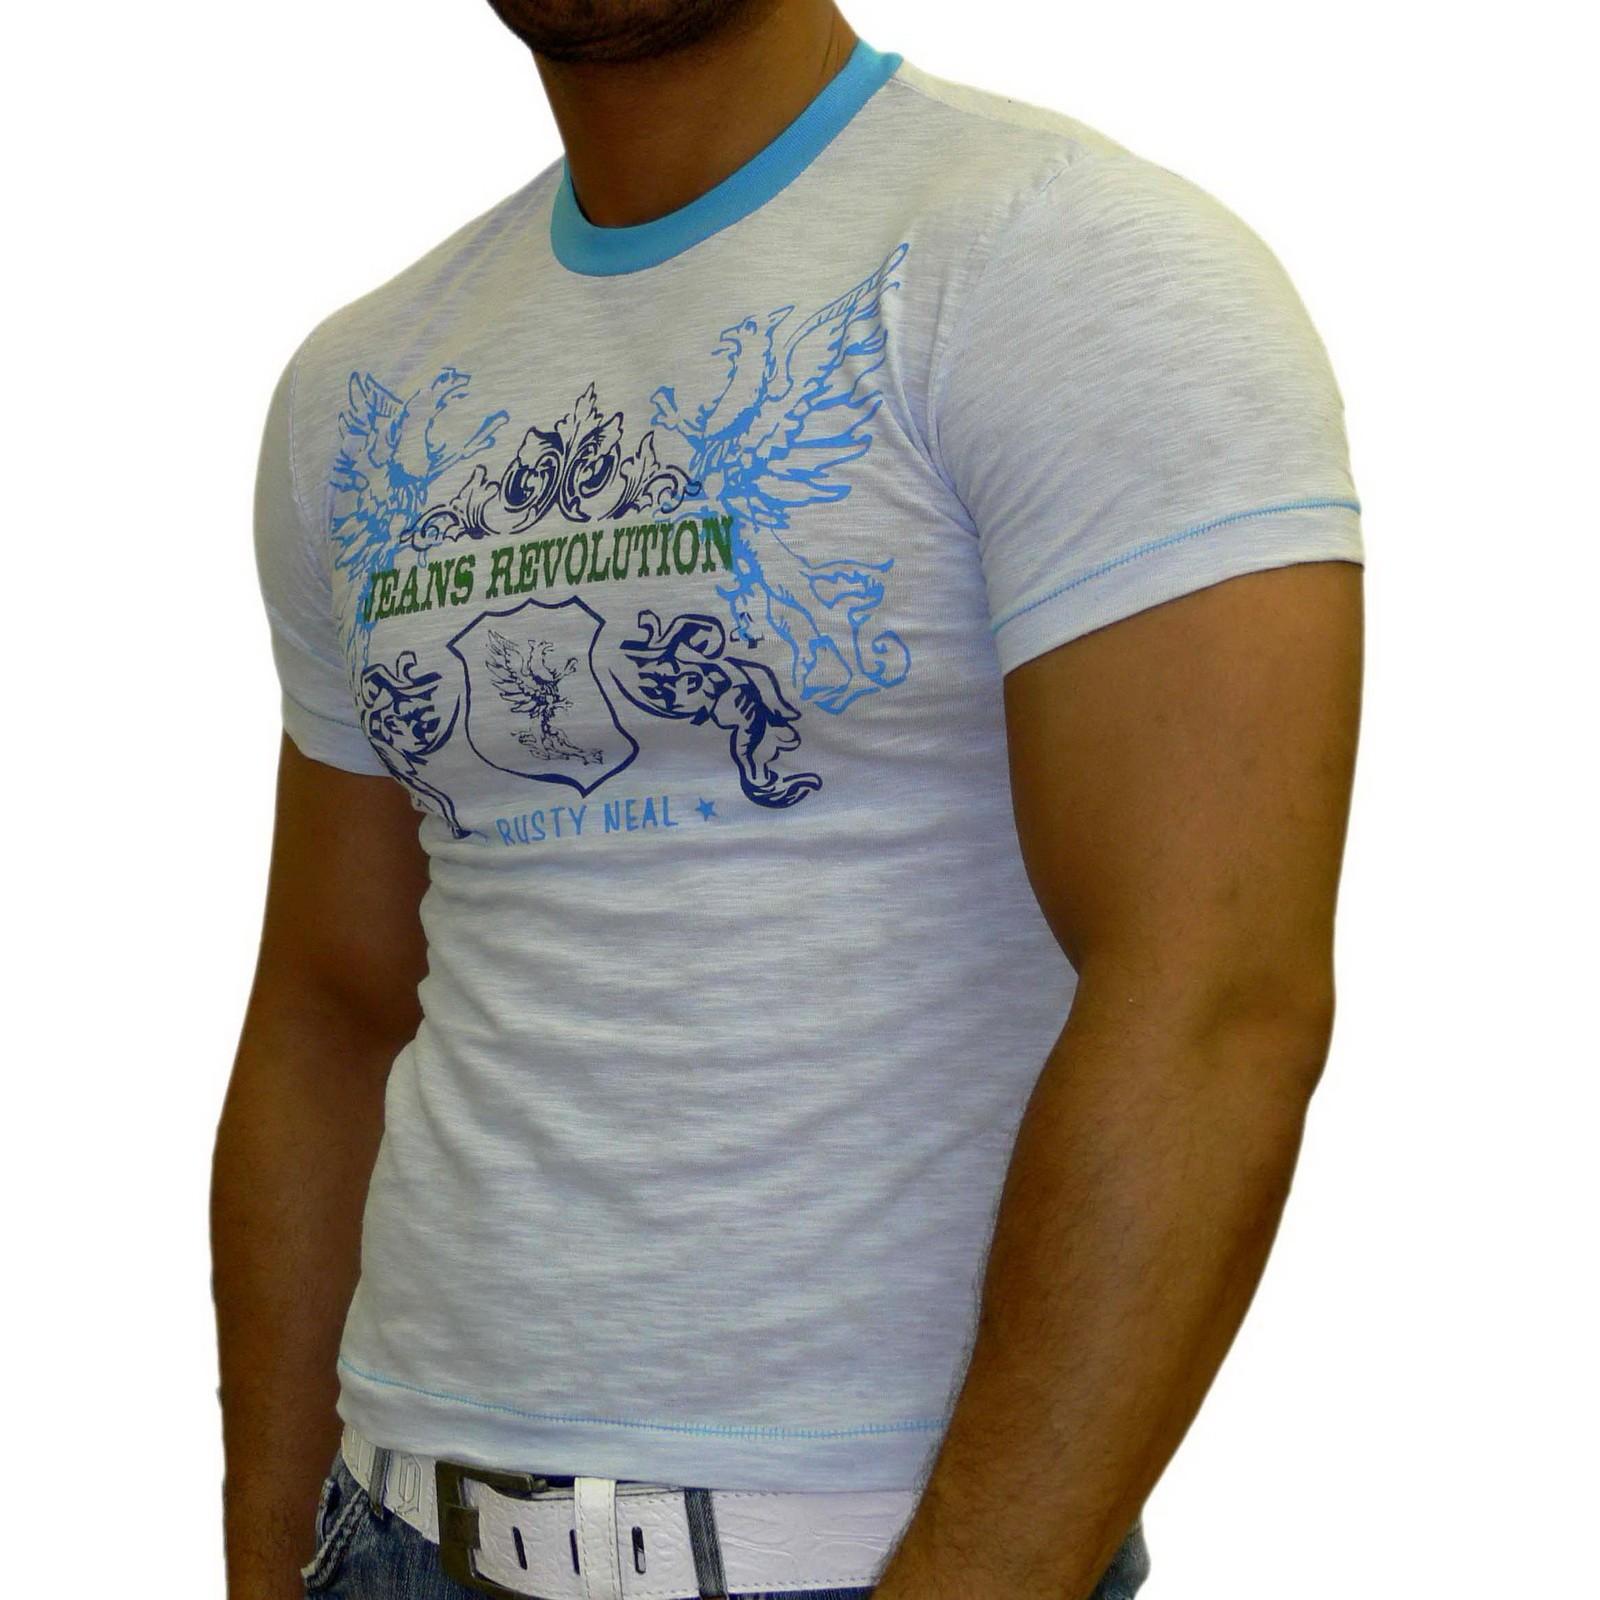 Rusty Neal Kurzarm Slim Fit Herren Rundhals Shirt Motiv T-Shirt Blau RN-312